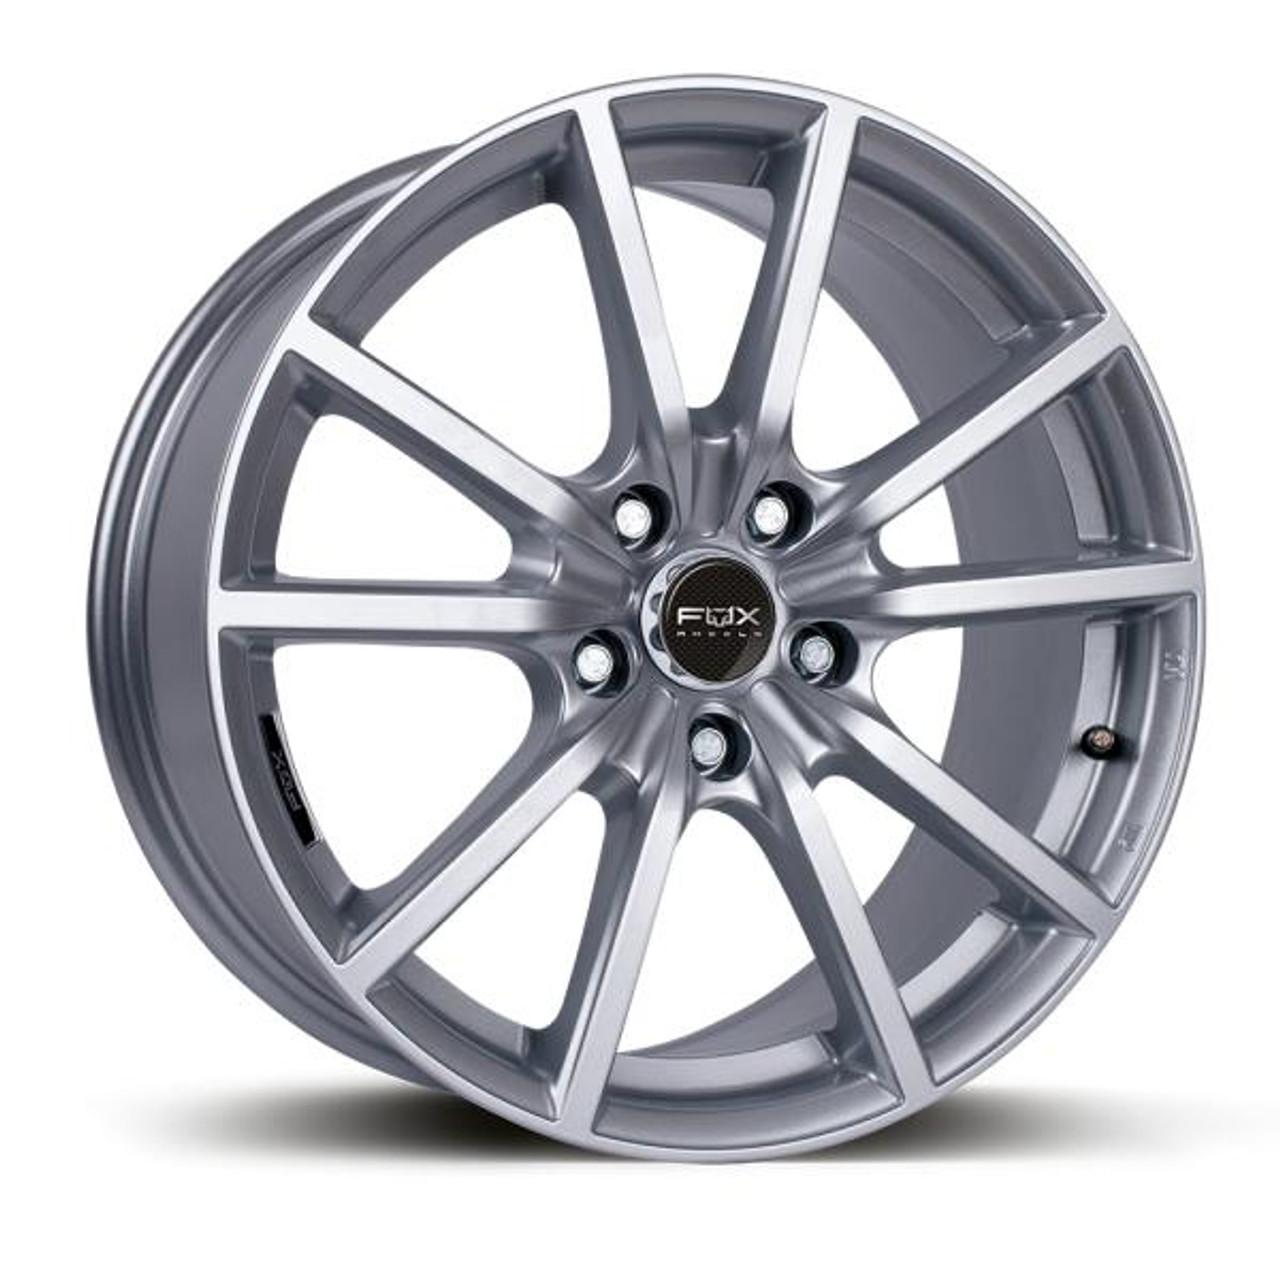 FOX FX10 Alloy Wheels Silver